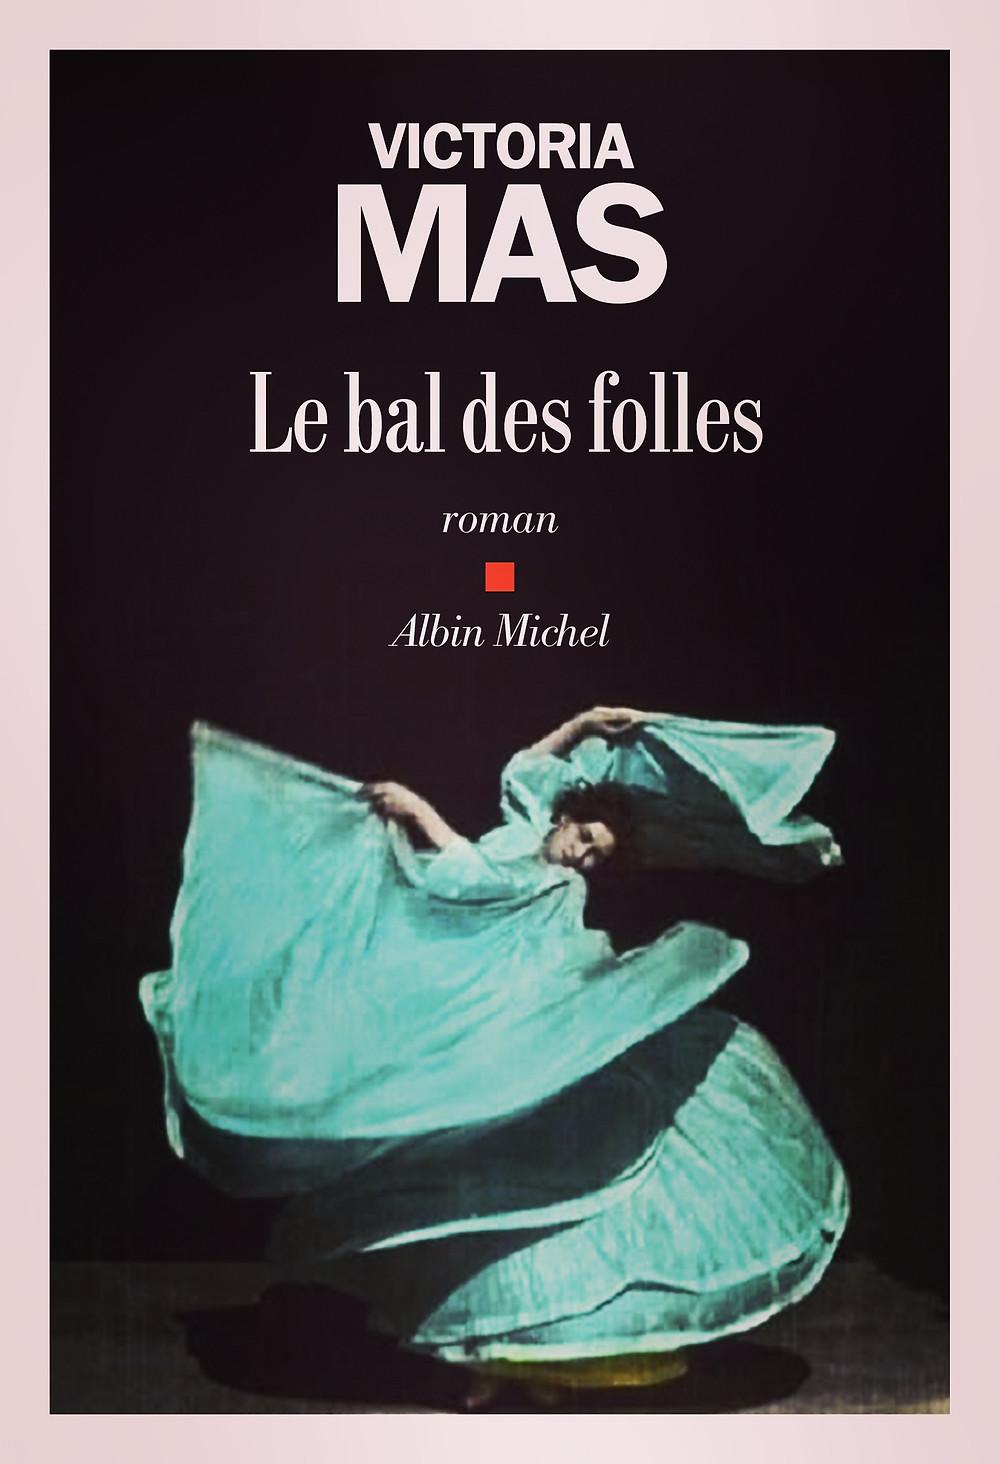 Roman «Le bal des folles» de Victoria Mas